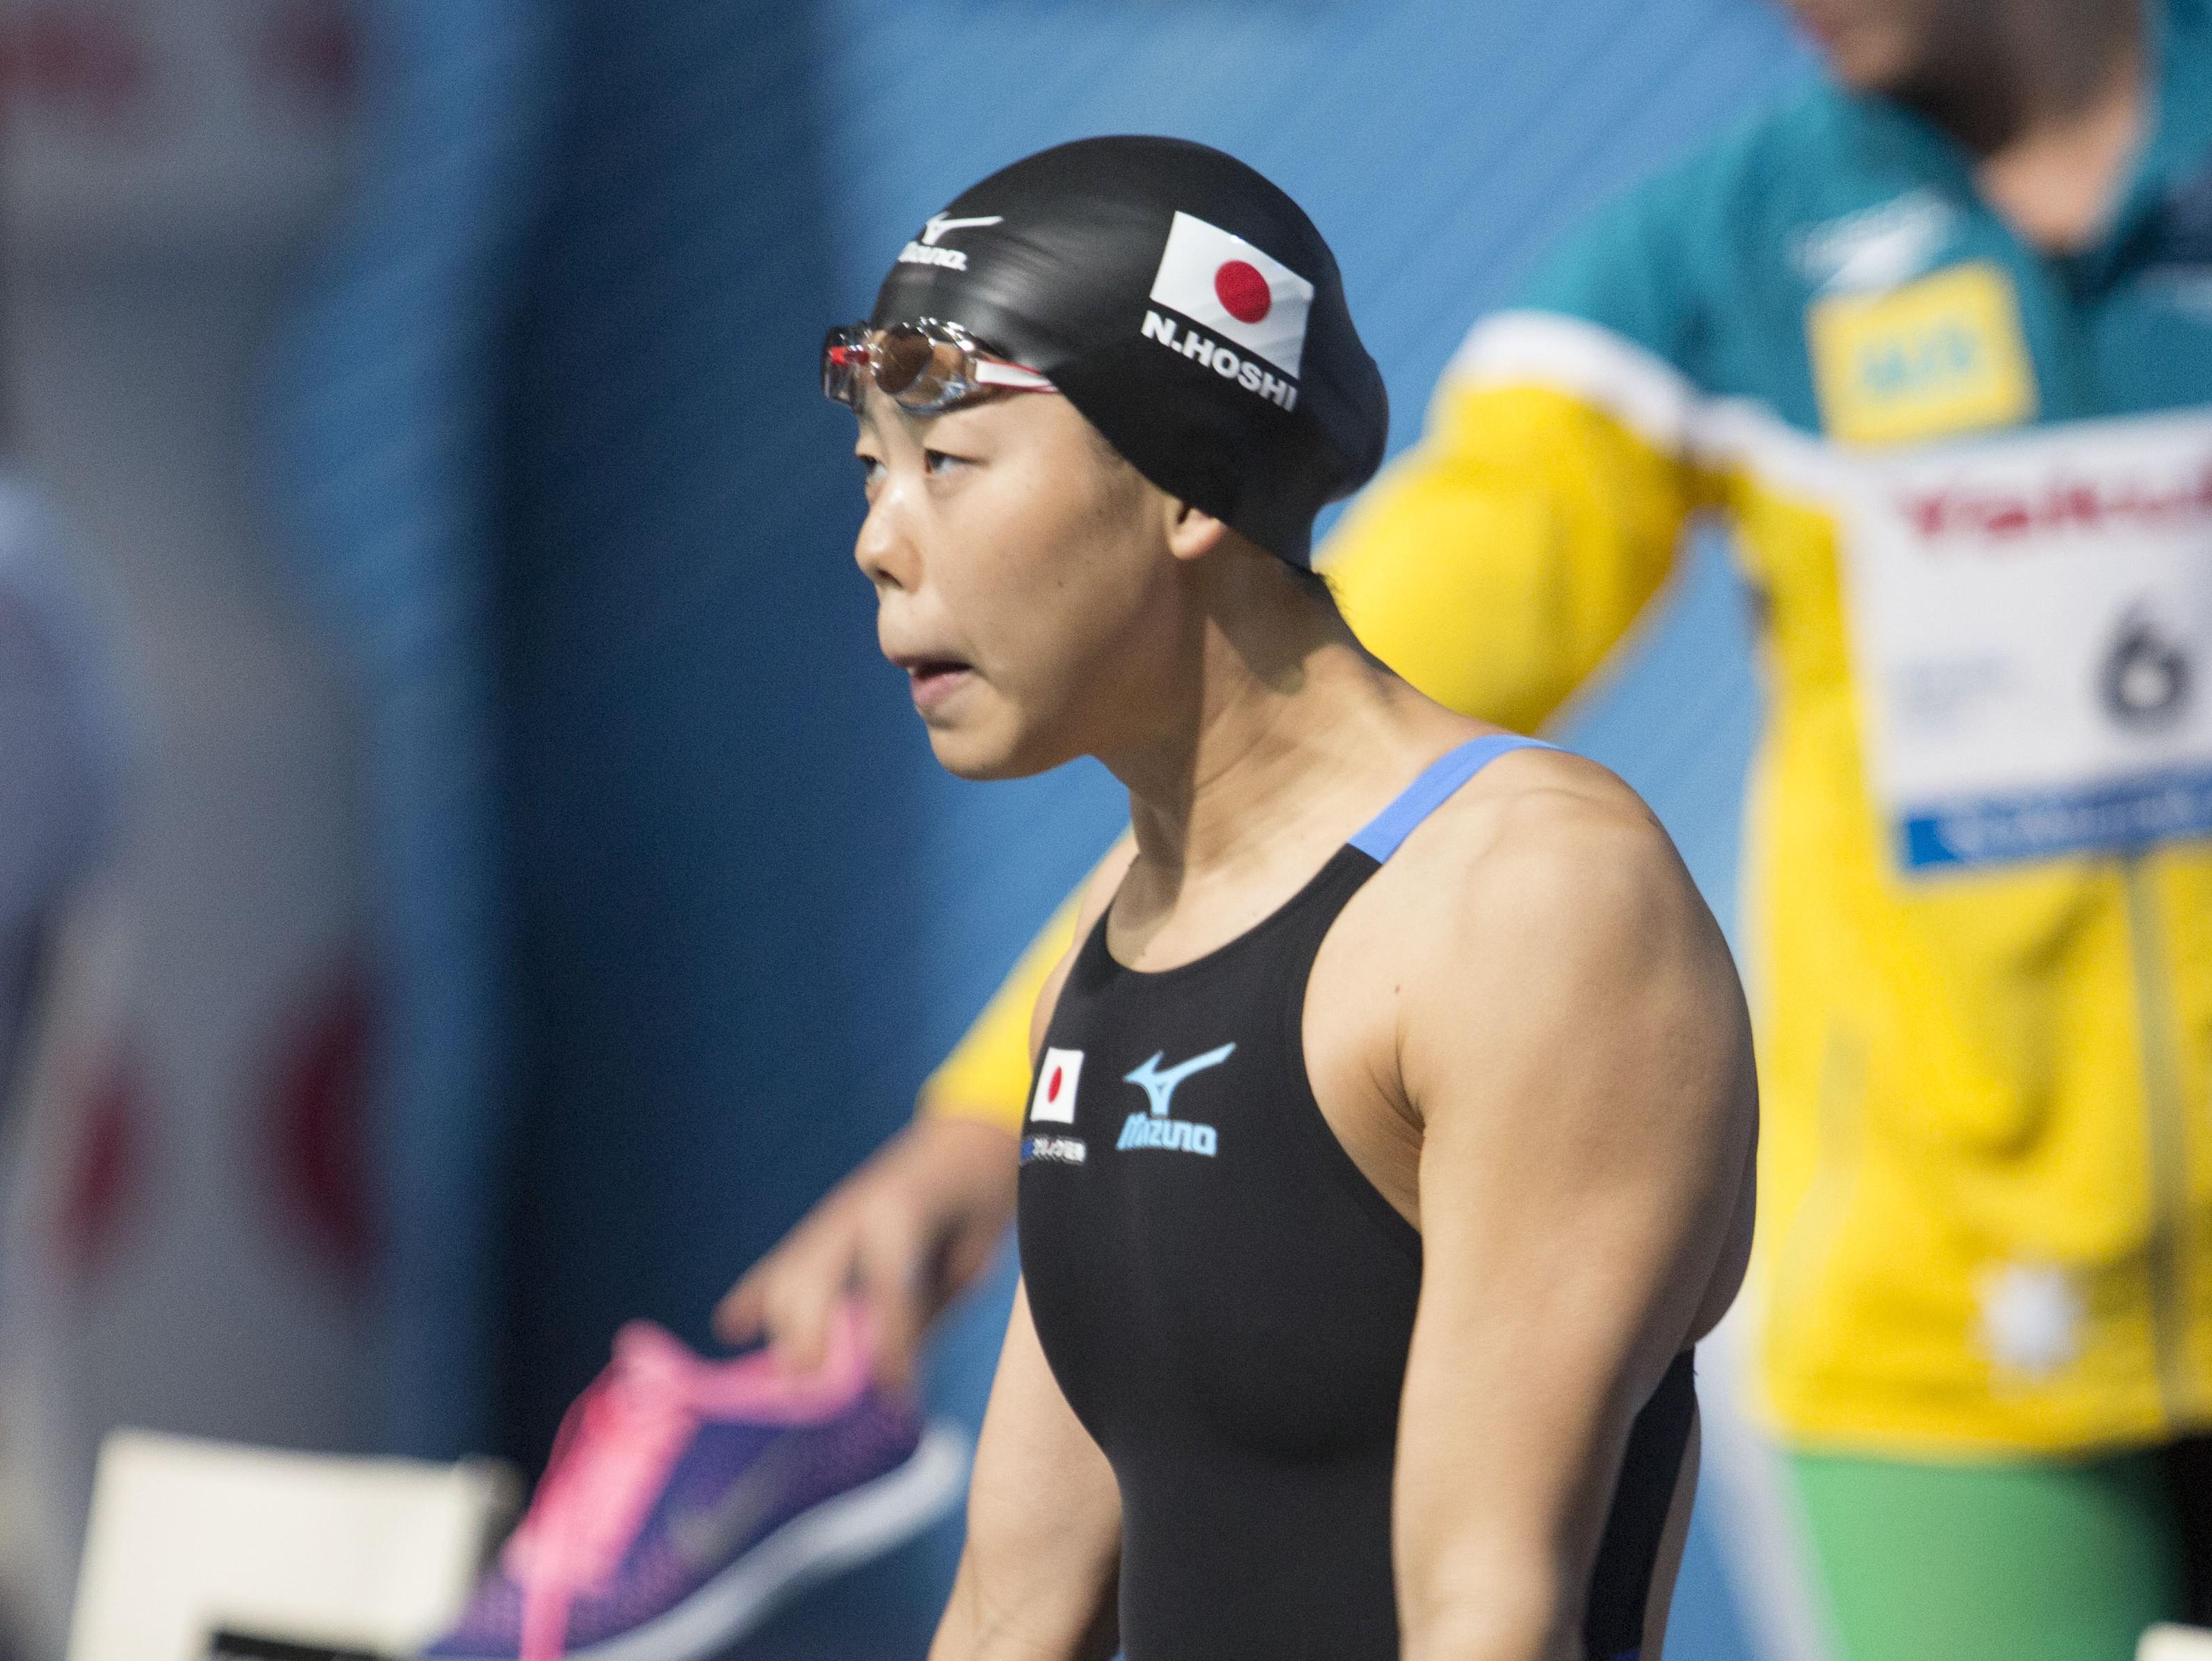 Natsumi Hoshi Natsumi Hoshi Tops Loaded 200 Fly Finale in Japan